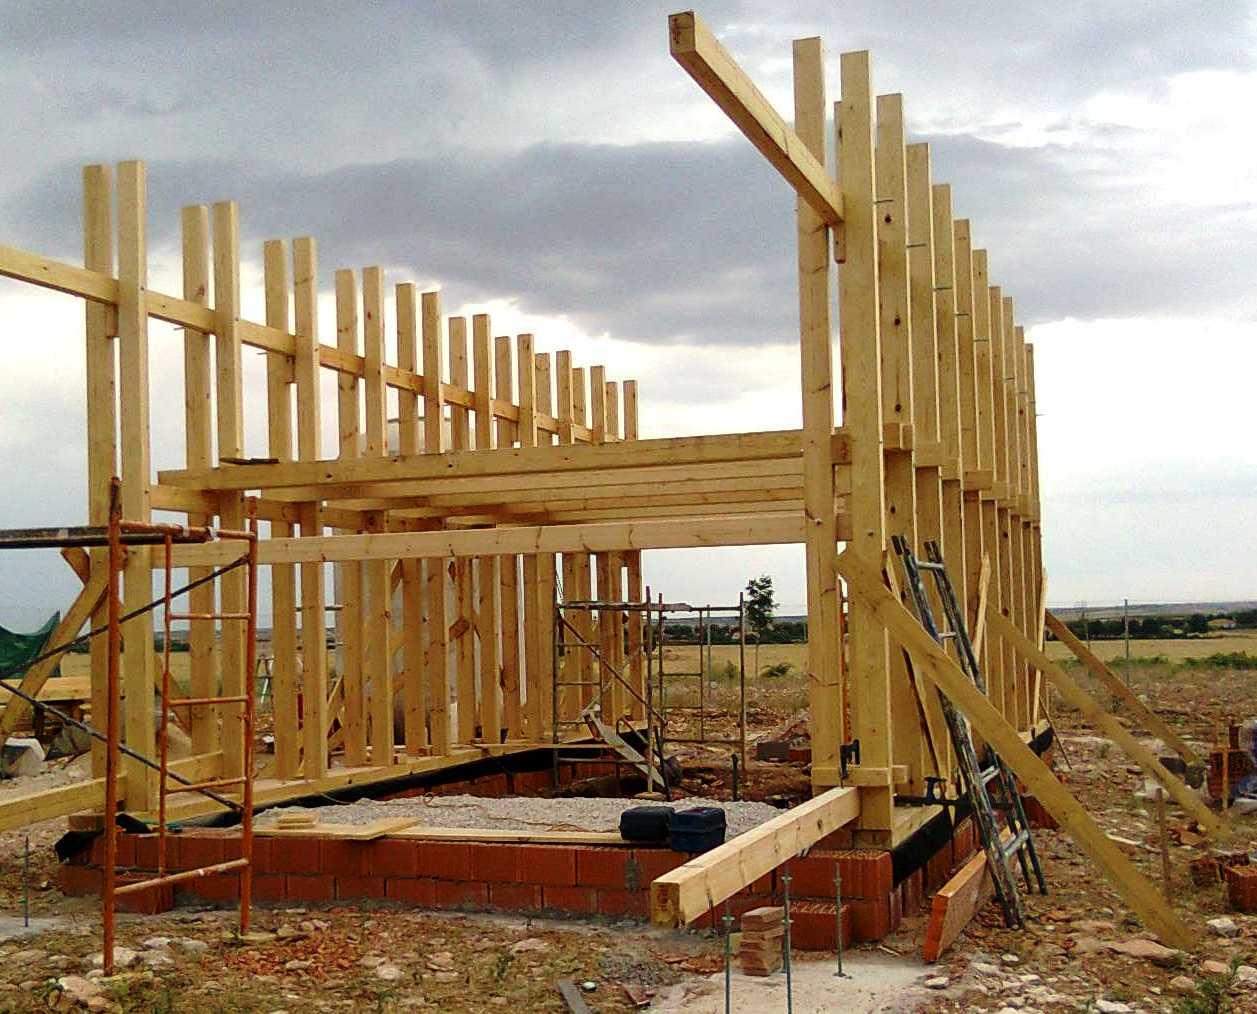 Canal 10 TV - Manzanares: AMMA organiza un taller de construcción de ...